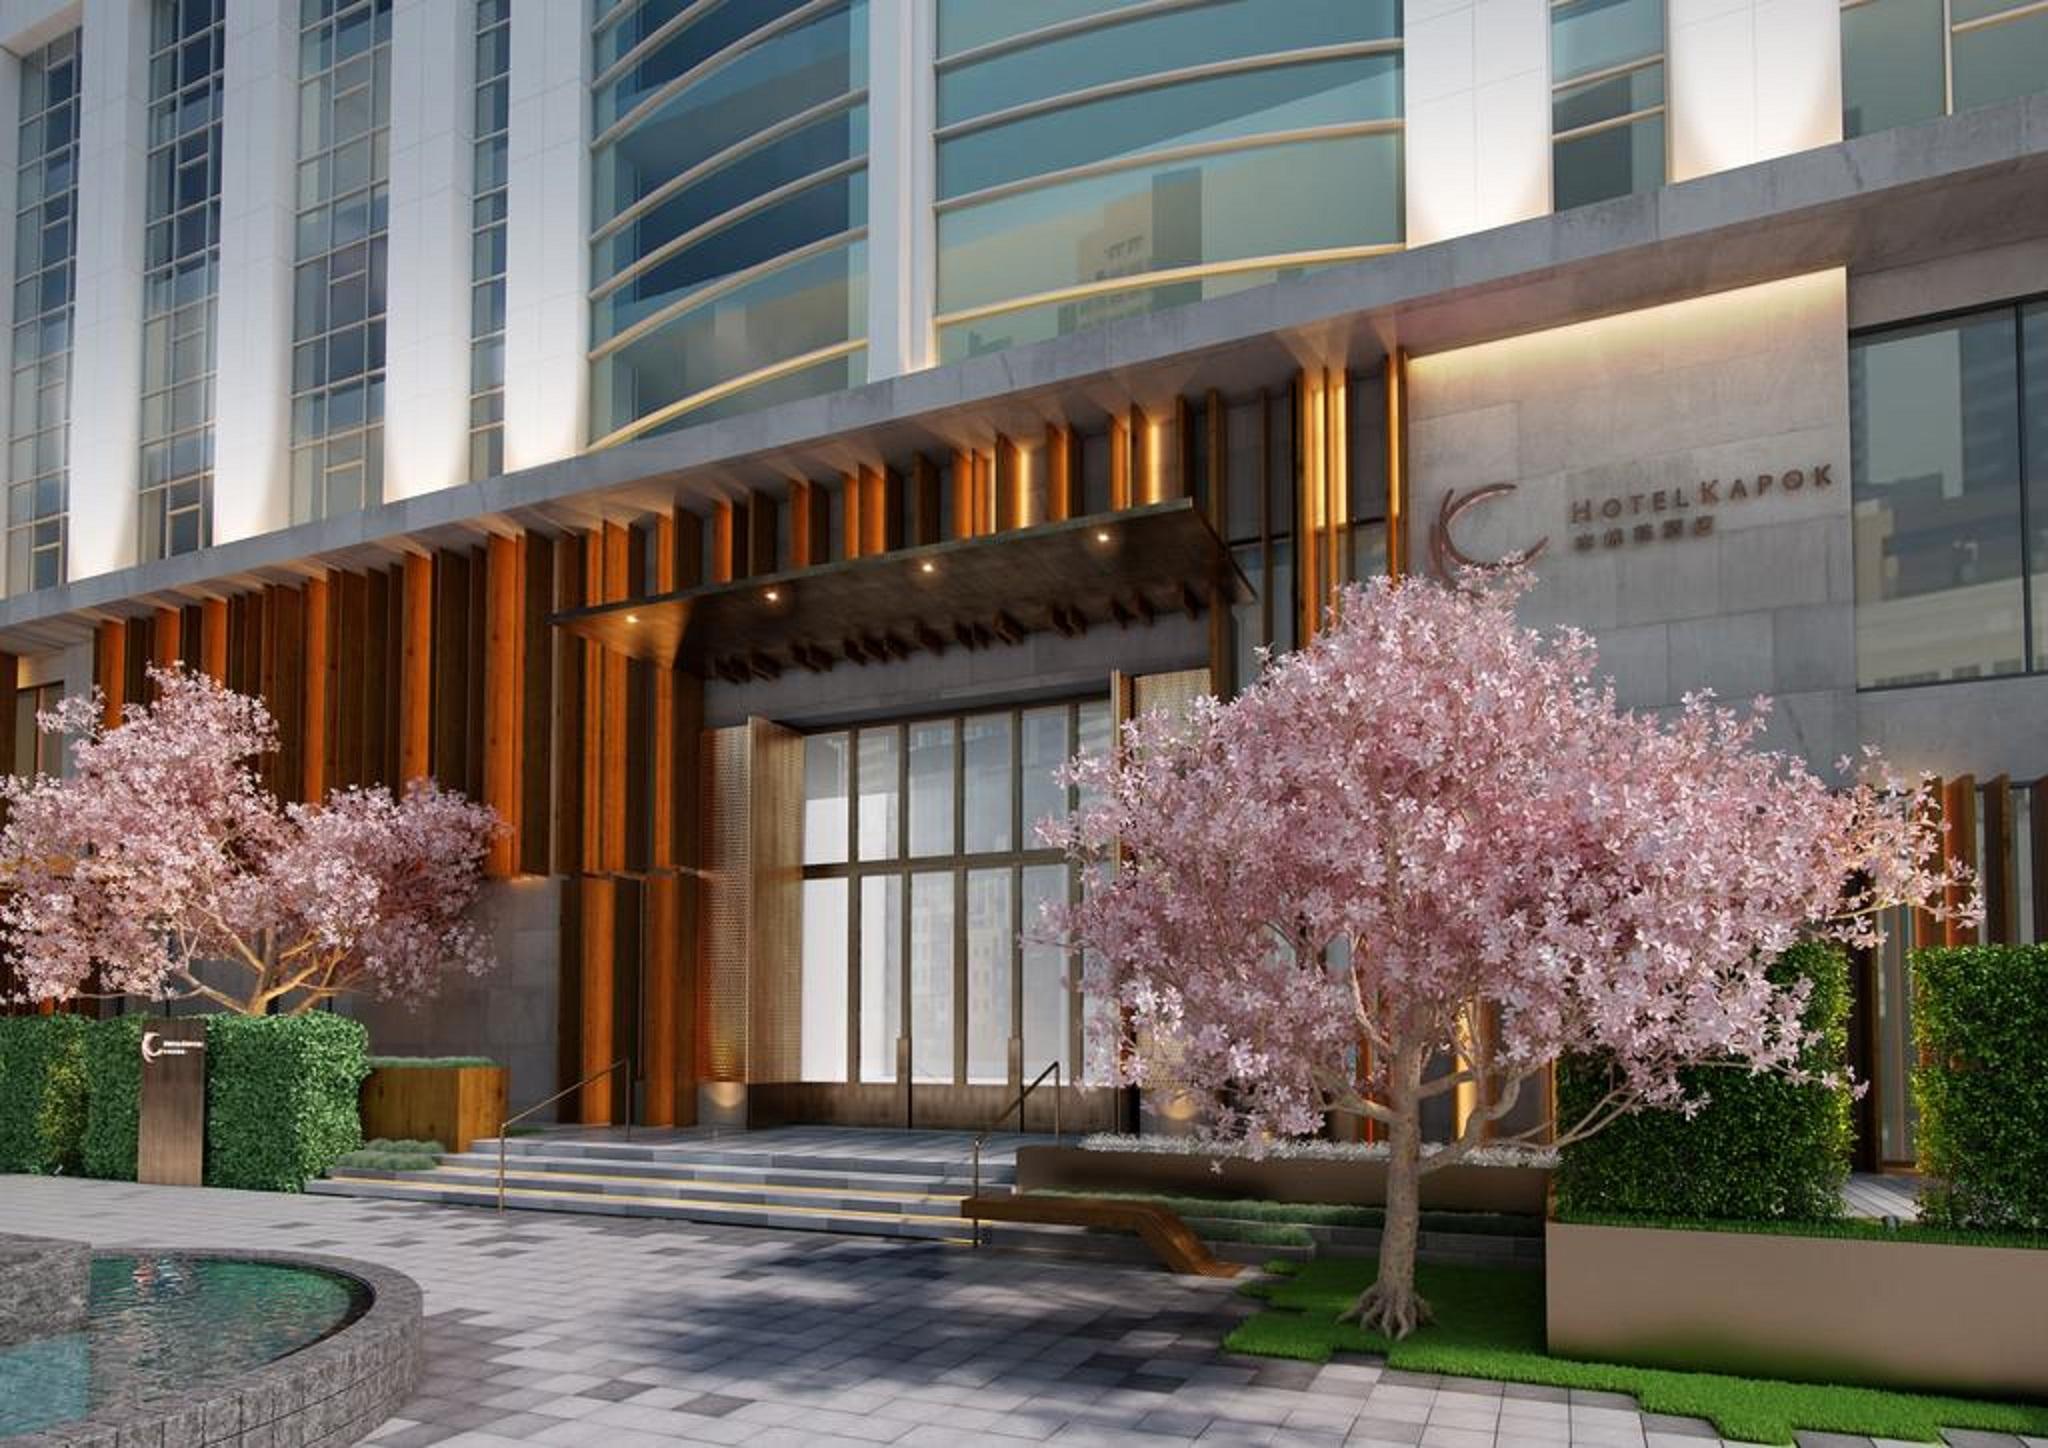 Hotel Kapok Shenzhen Luohu, North